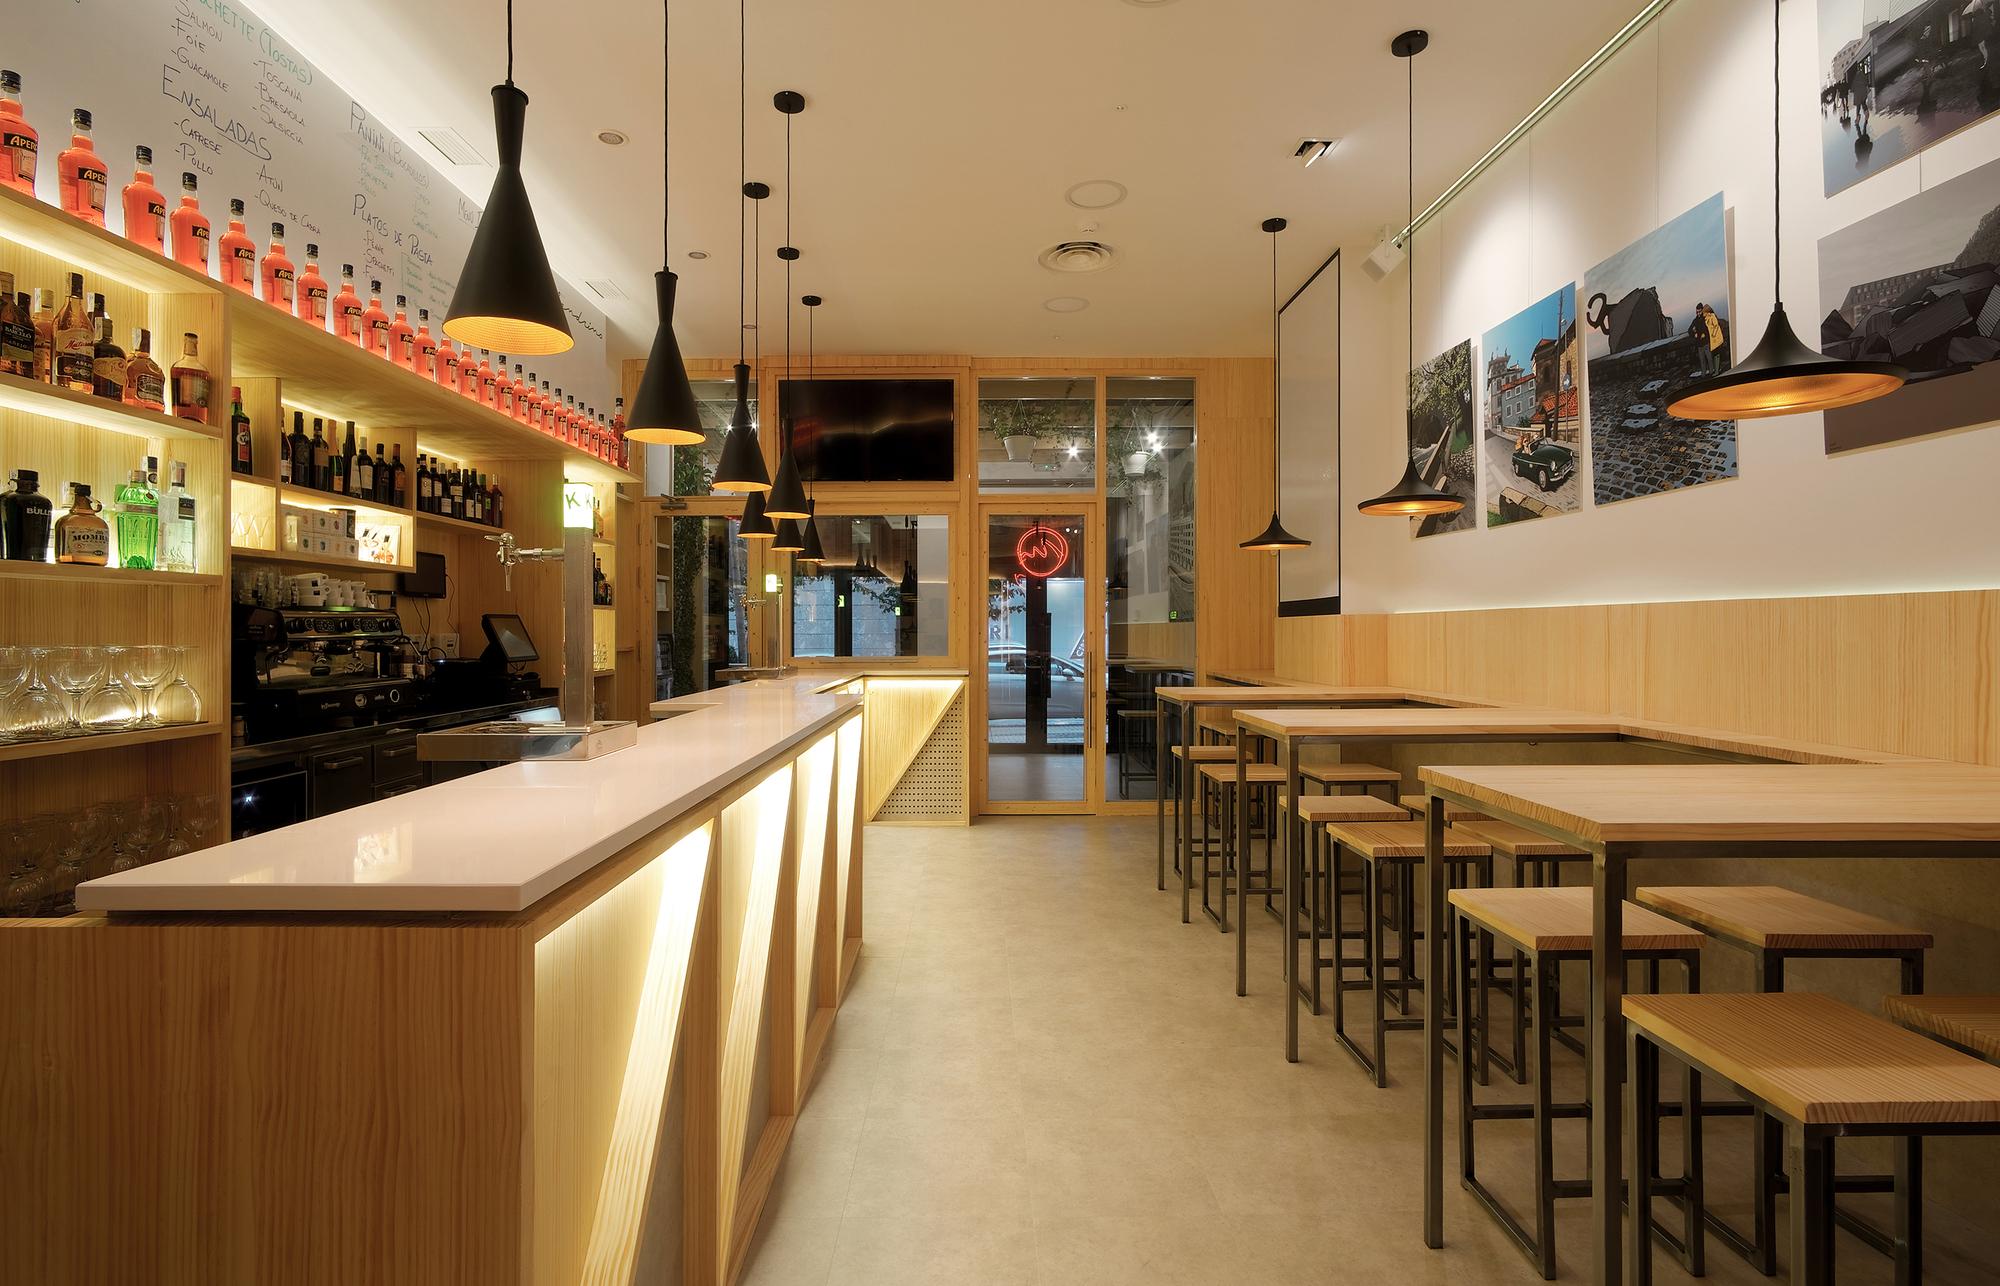 Malandrino Caff Bar Pura Arquitectura Plataforma